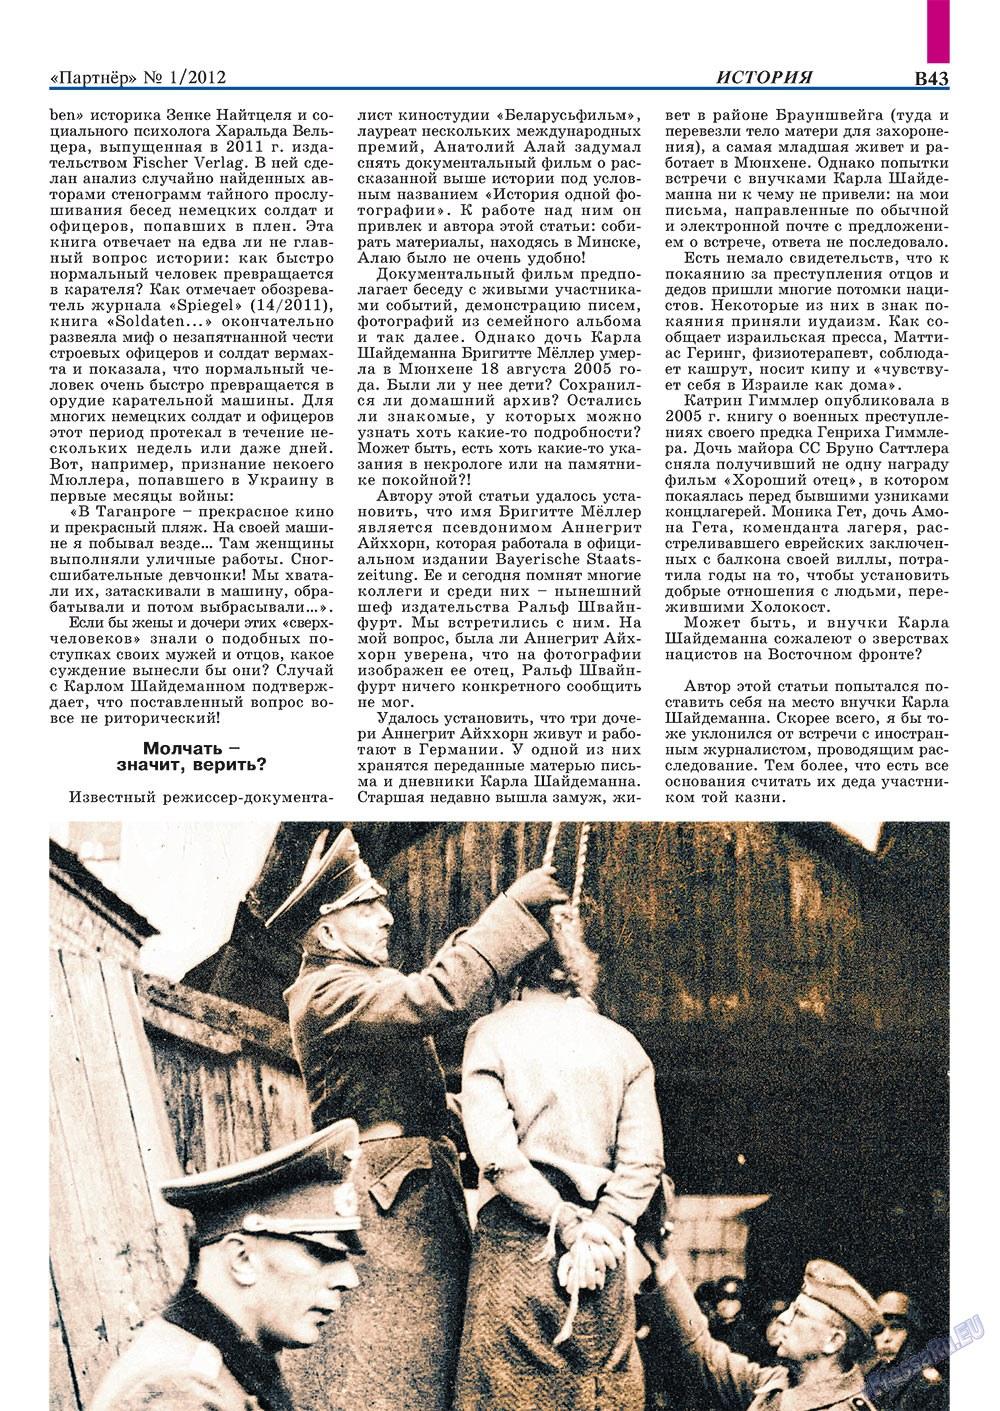 Партнер-север (журнал). 2012 год, номер 1, стр. 53